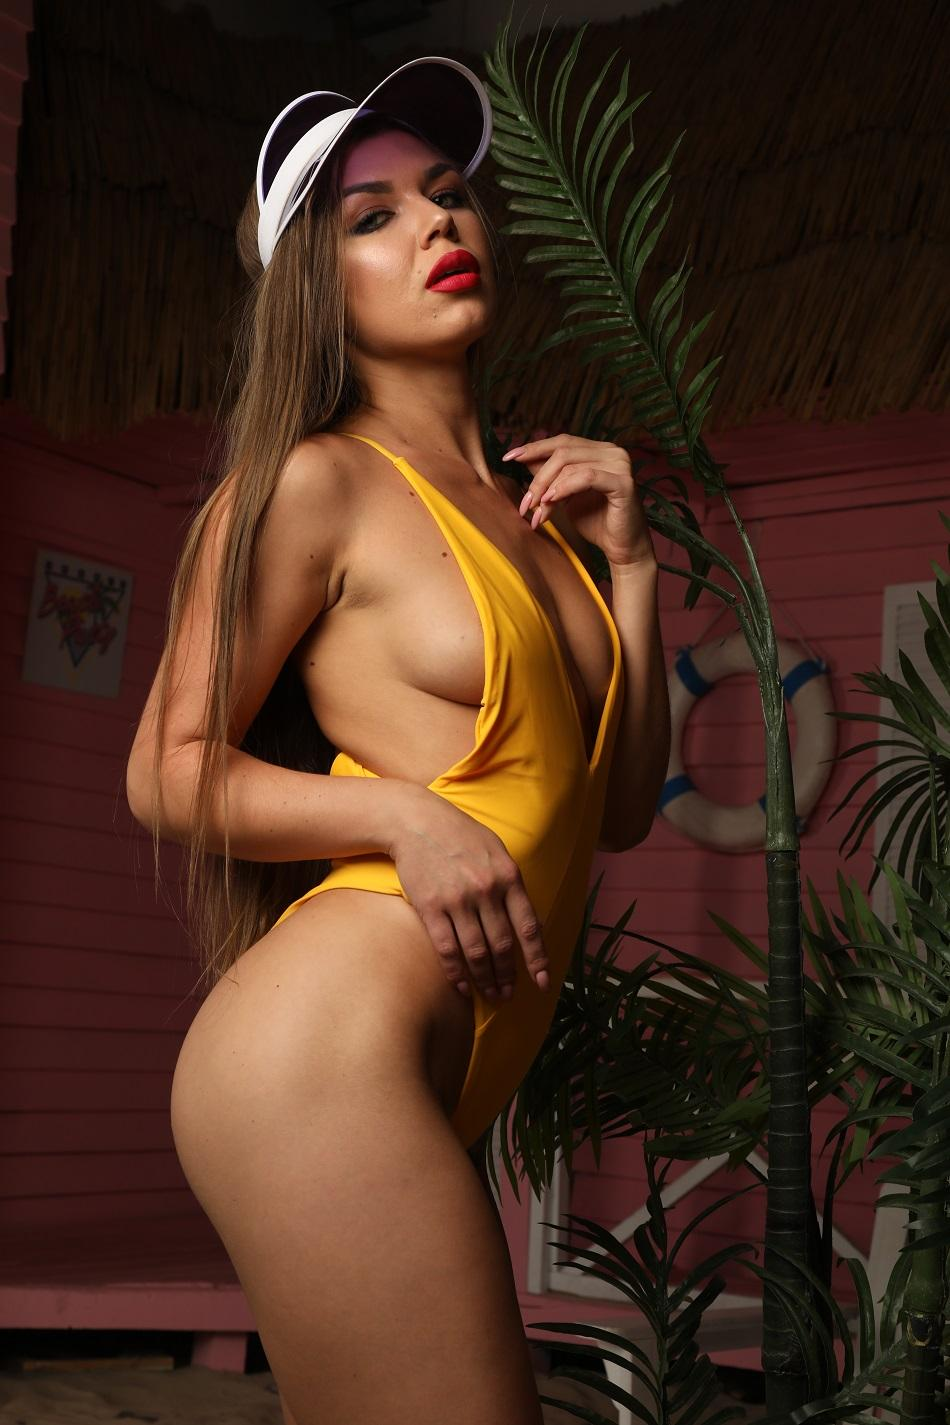 Leela Escort Girl In New York 24093852 - 3 3